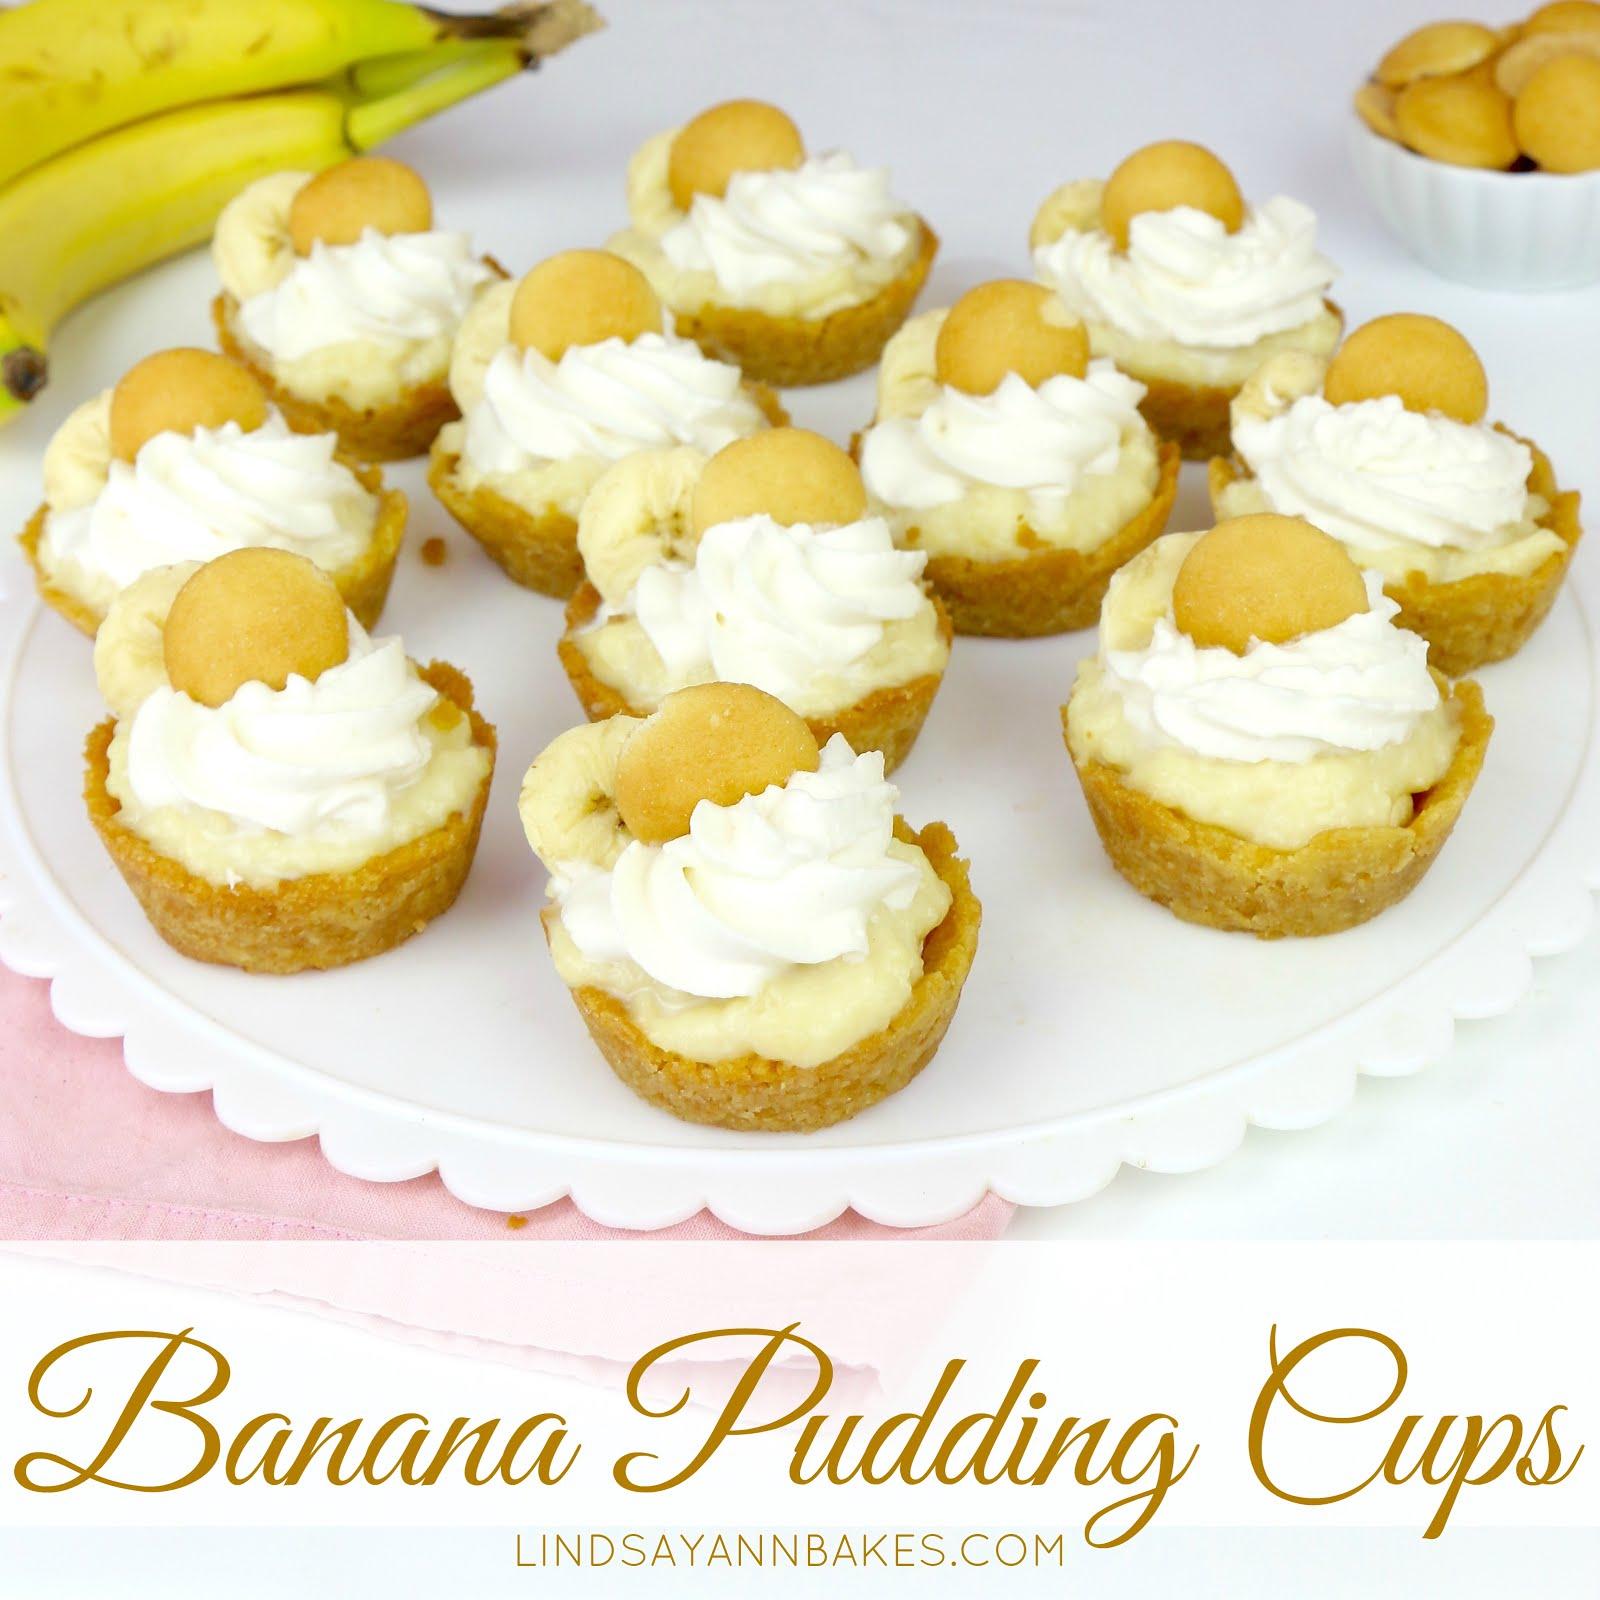 Video Mini Banana Pudding Cups The Lindsay Ann